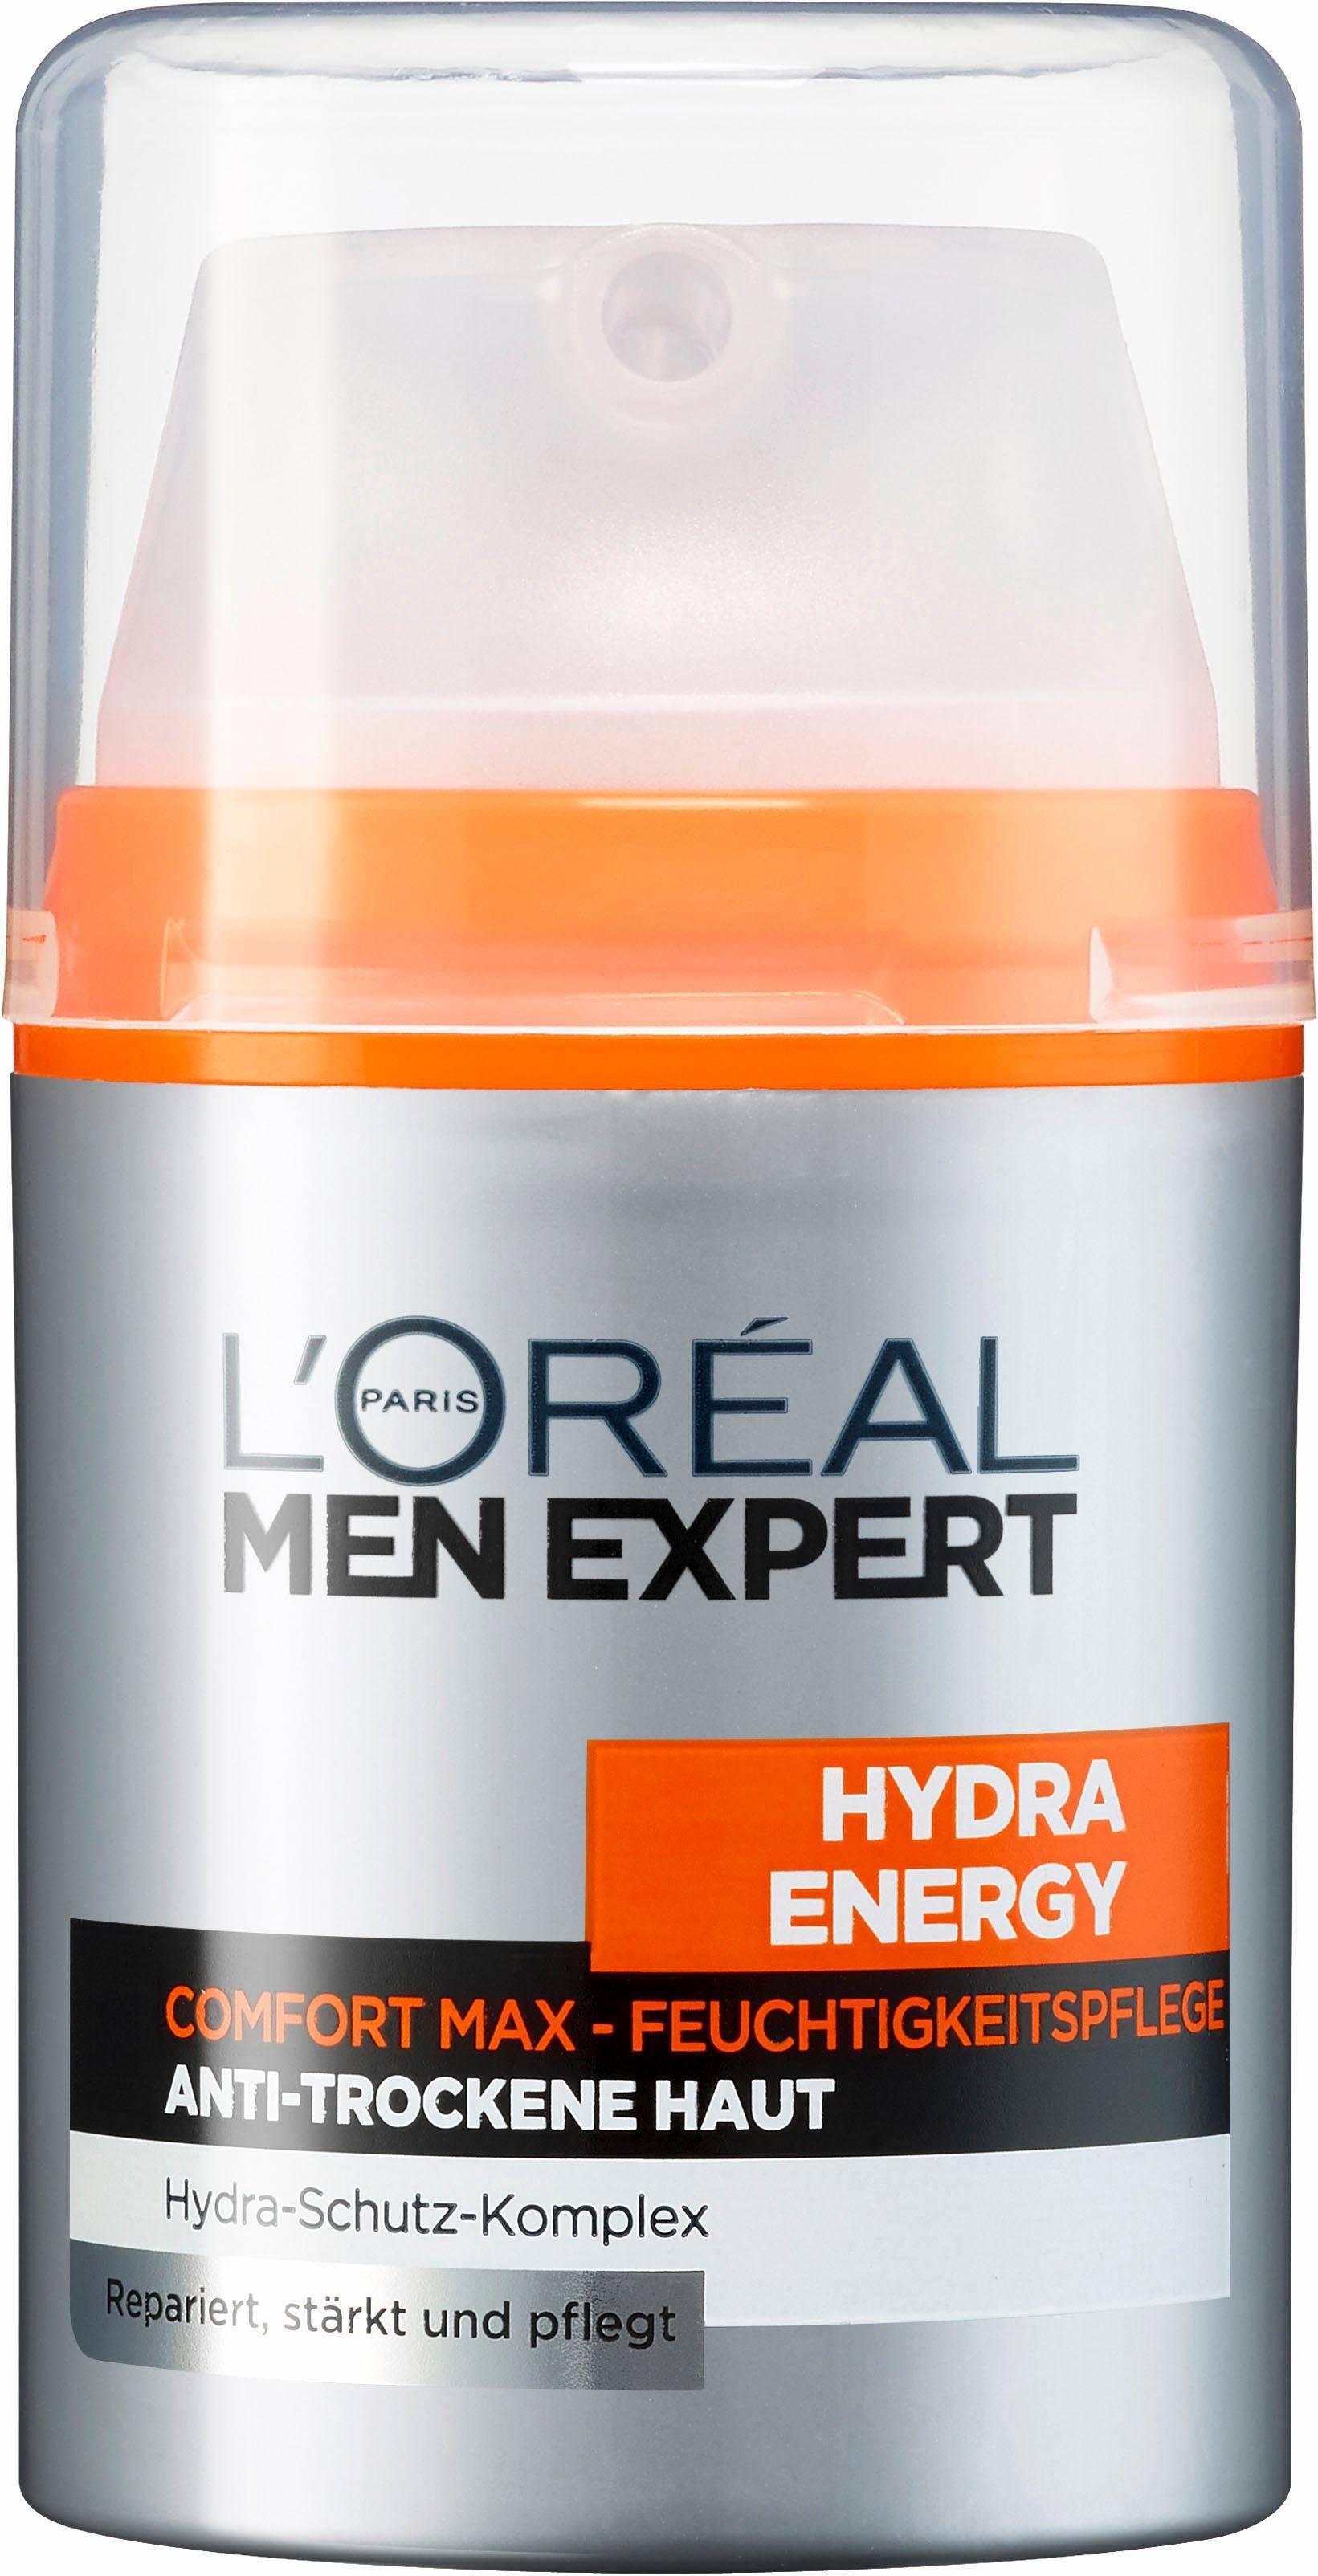 L'Oréal Paris Men Expert, »Hydra Energy Comfort Max«, Männerpflege